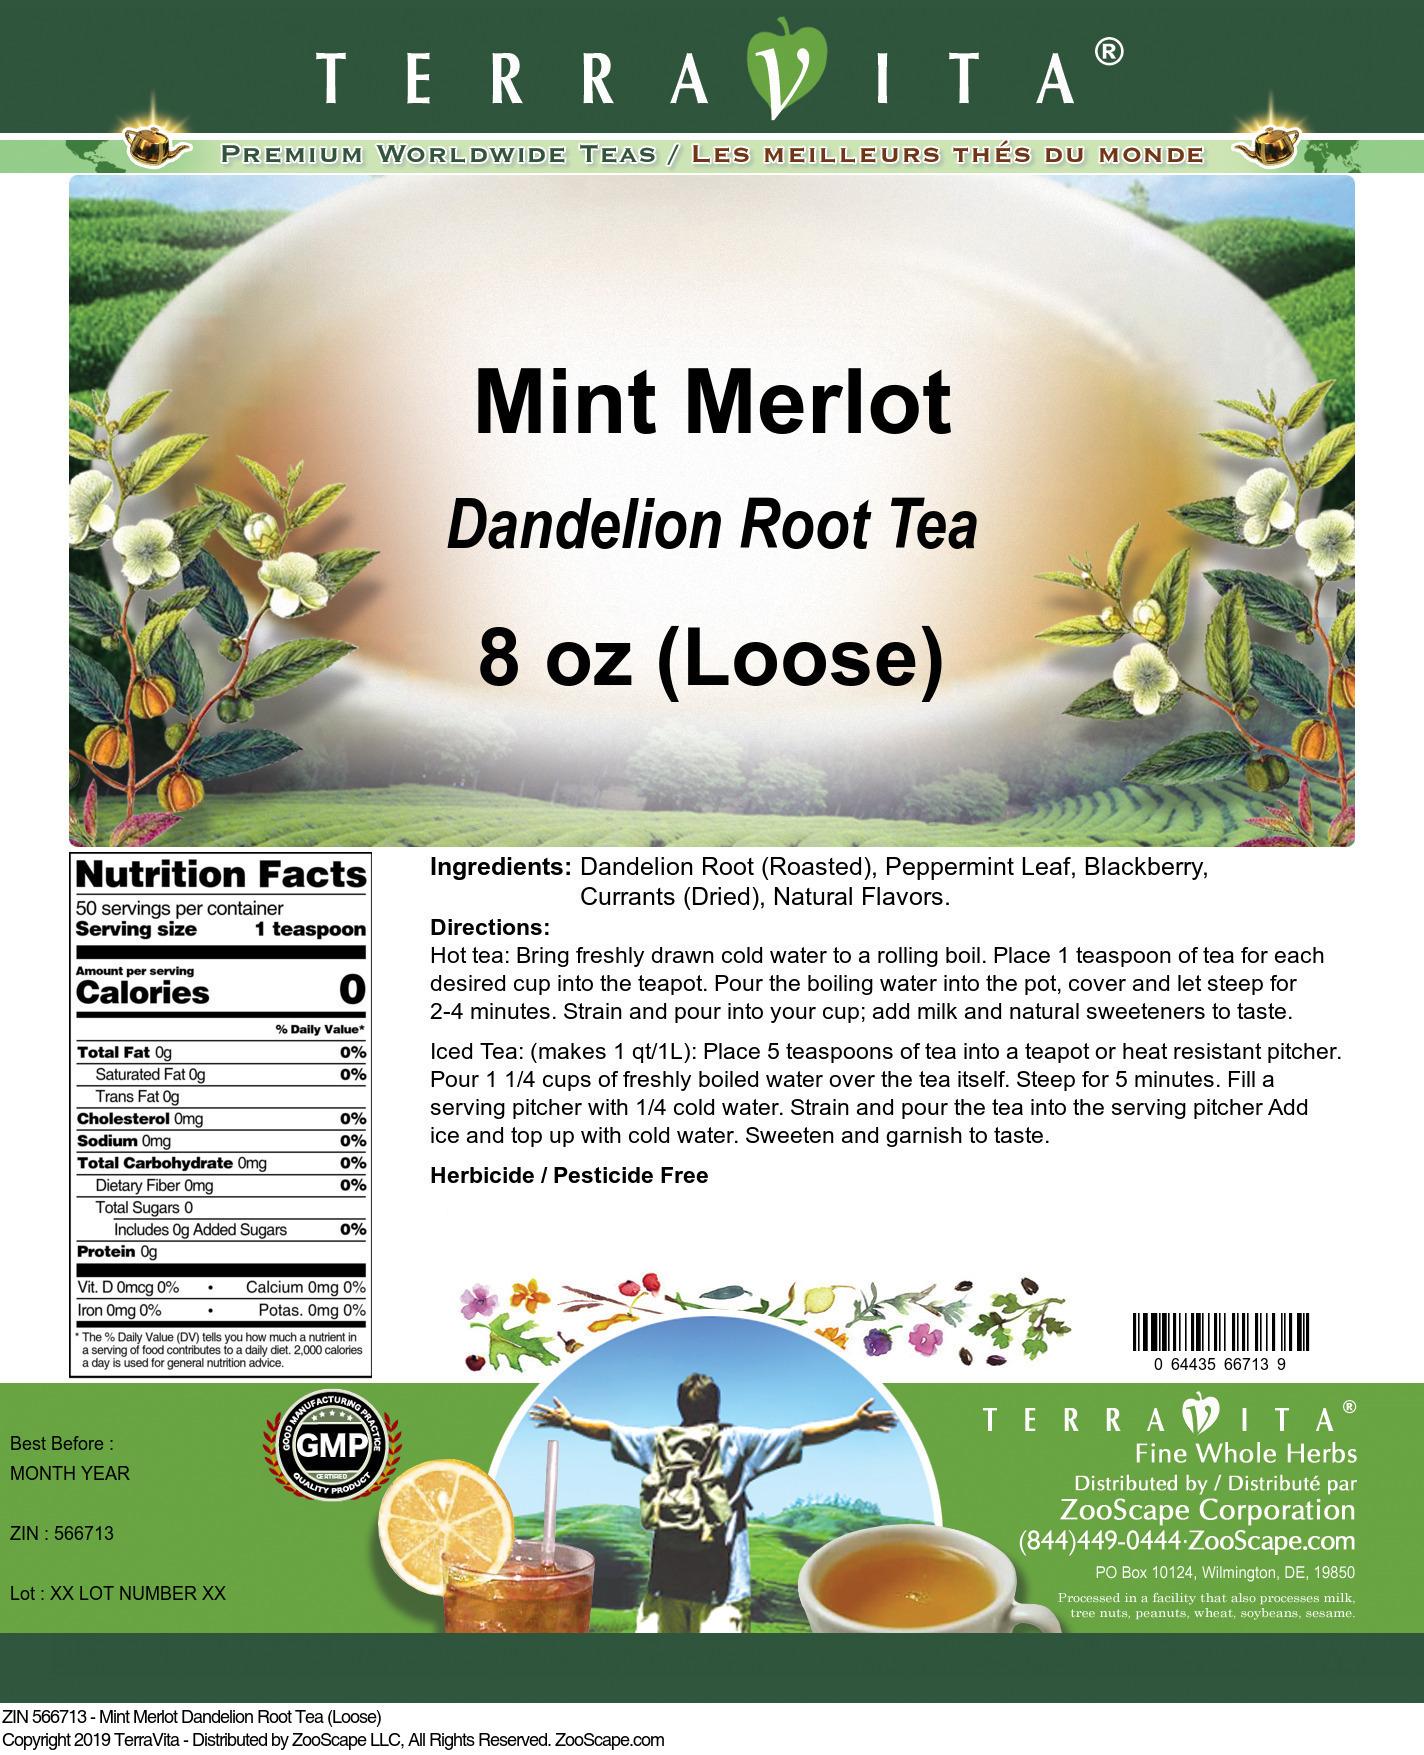 Mint Merlot Dandelion Root